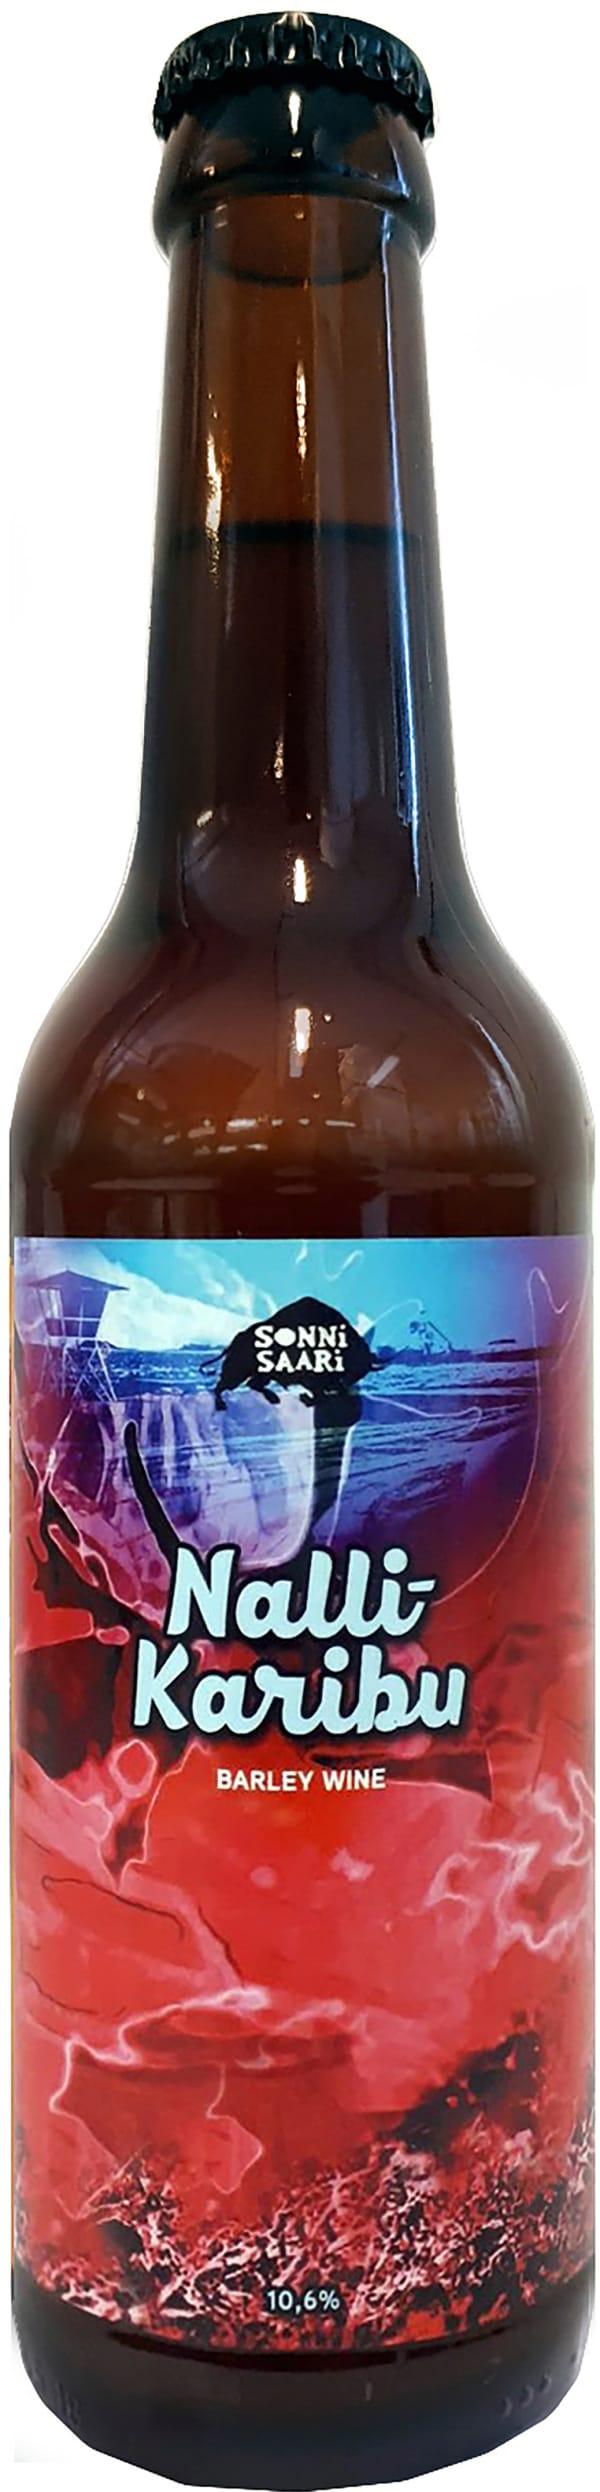 Sonnisaari Nallikaribu Barley Wine